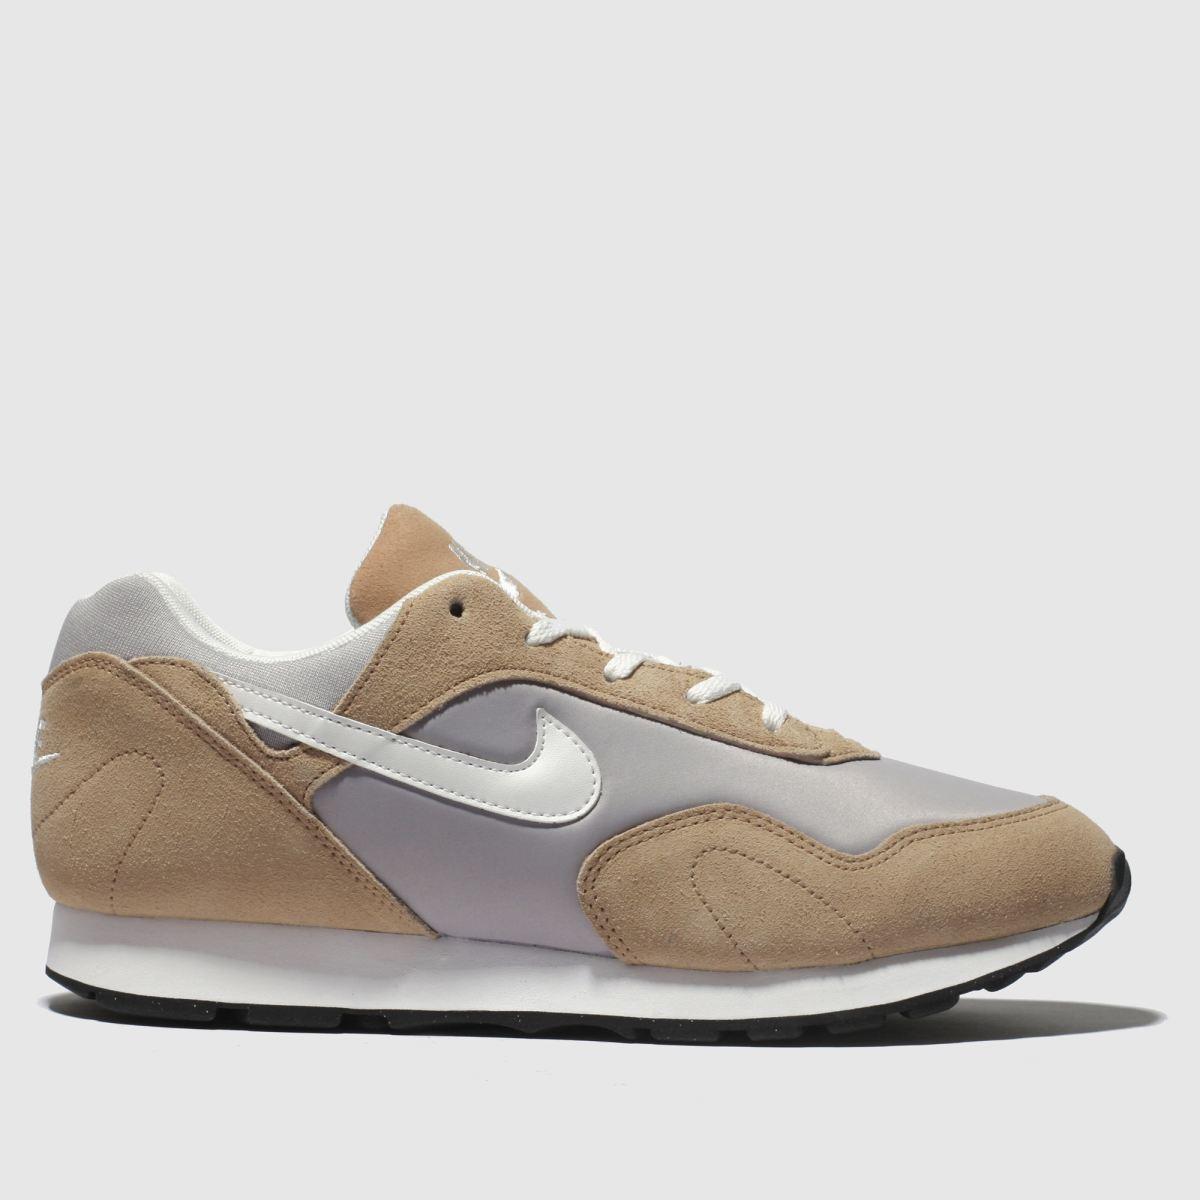 Nike Peach Outburst Trainers